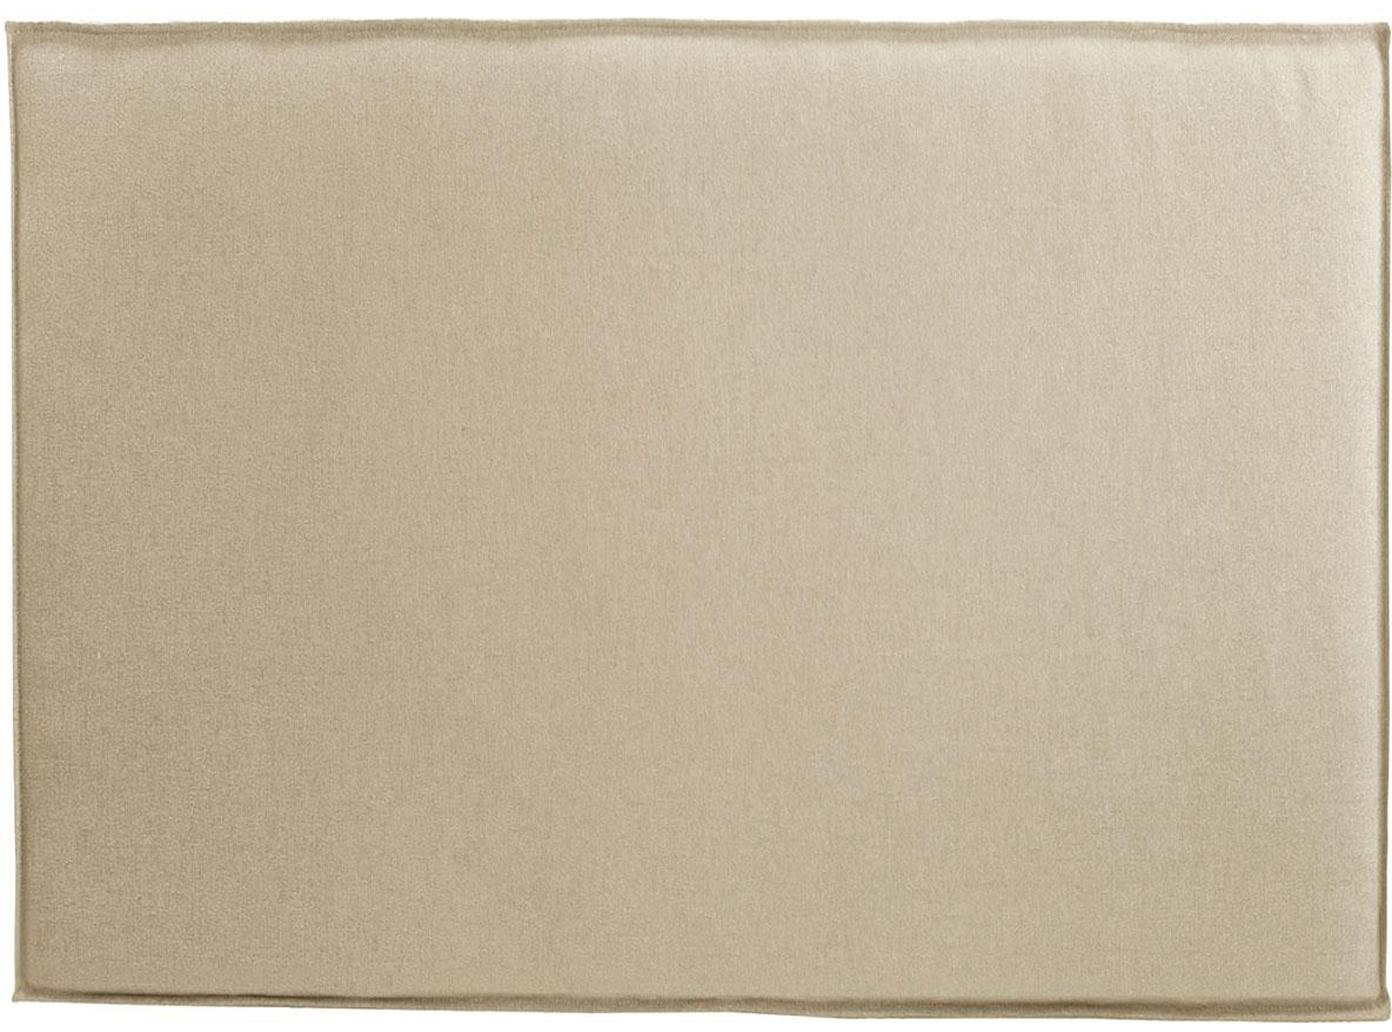 Cabecero Siena, Estructura: madera de pino, madera co, Tapizado: 100%poliéster Alta resis, Beige, An 100 x Al 80 cm